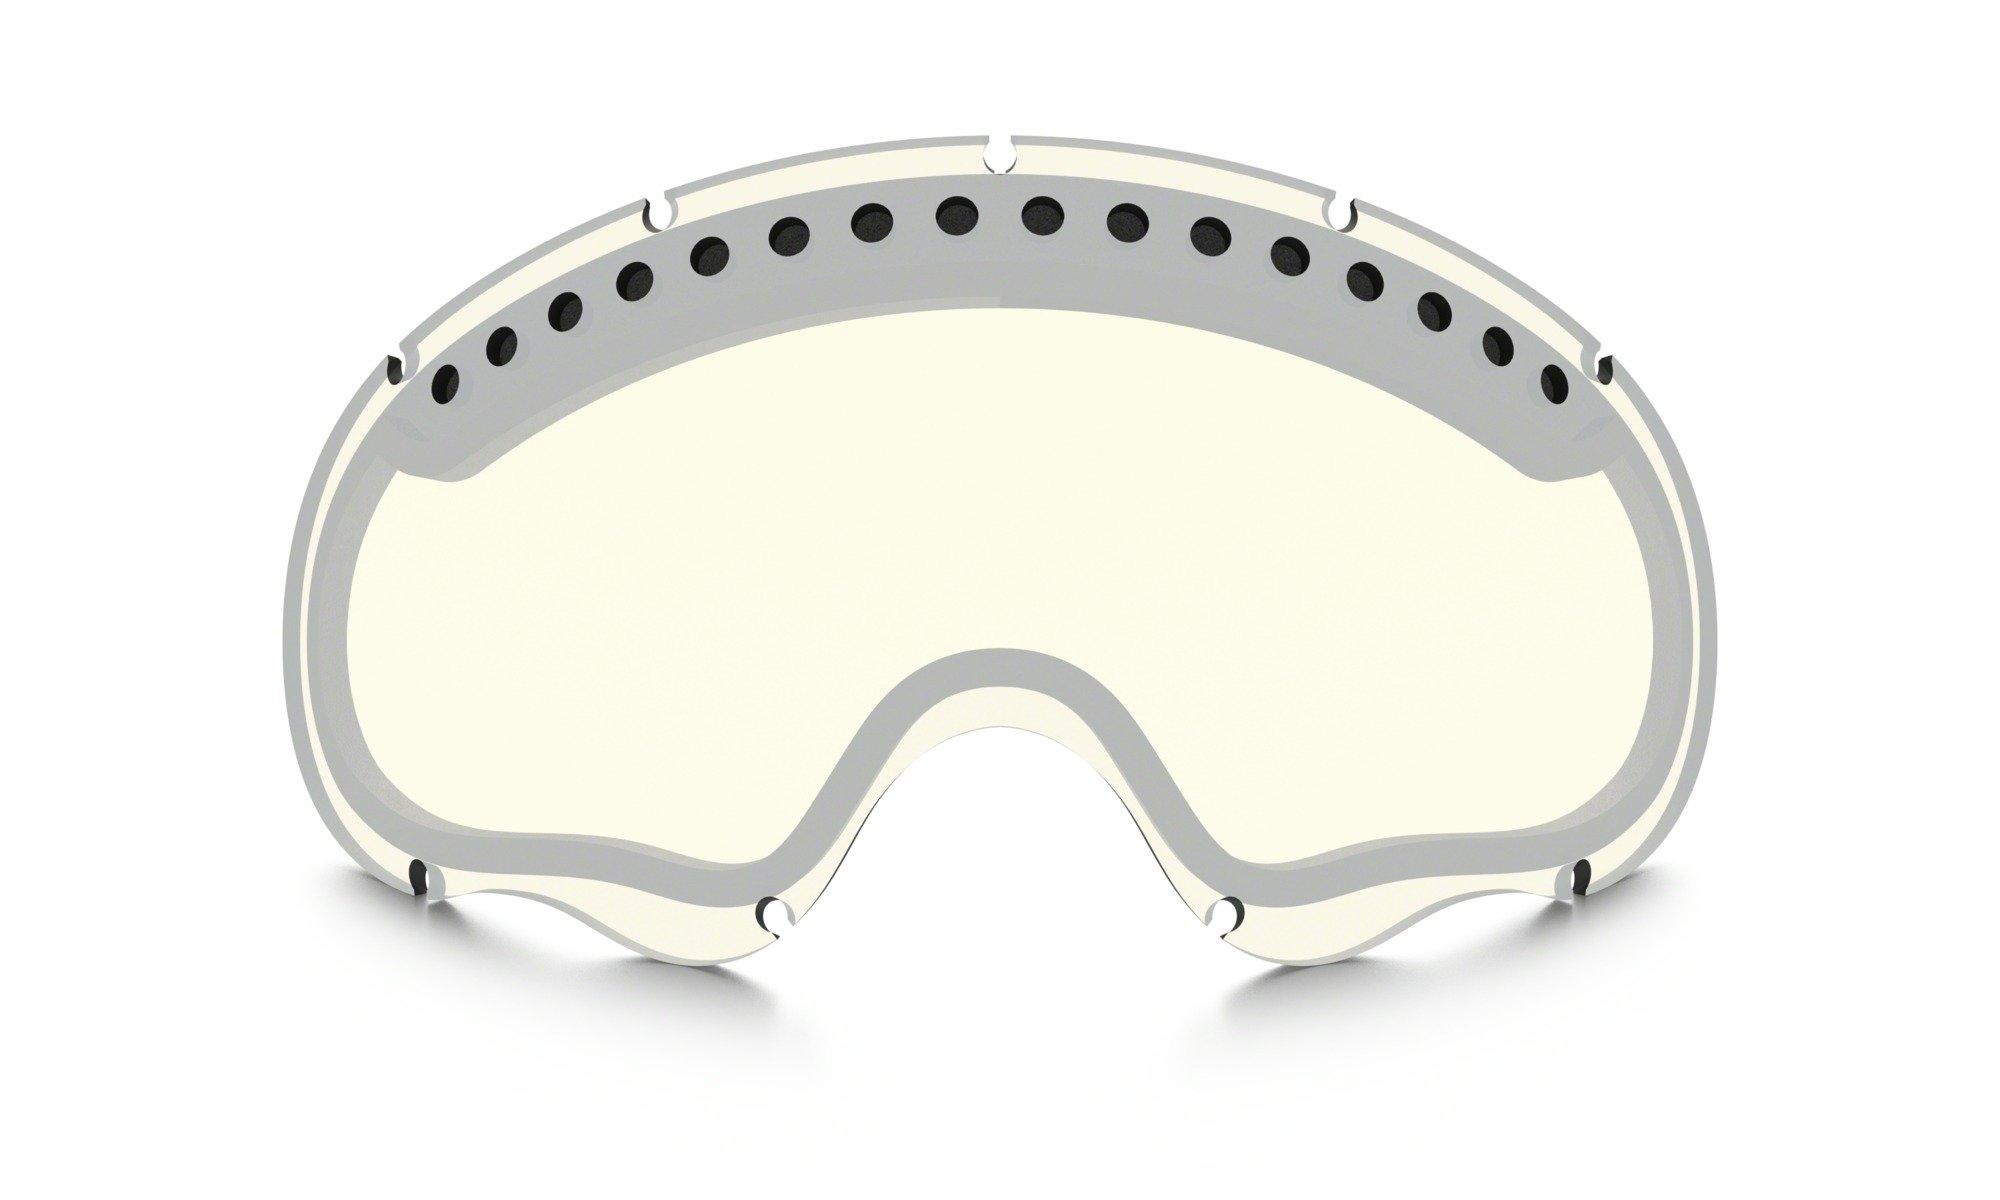 Oakley Goggle Lens Color / Tint Guide | evo